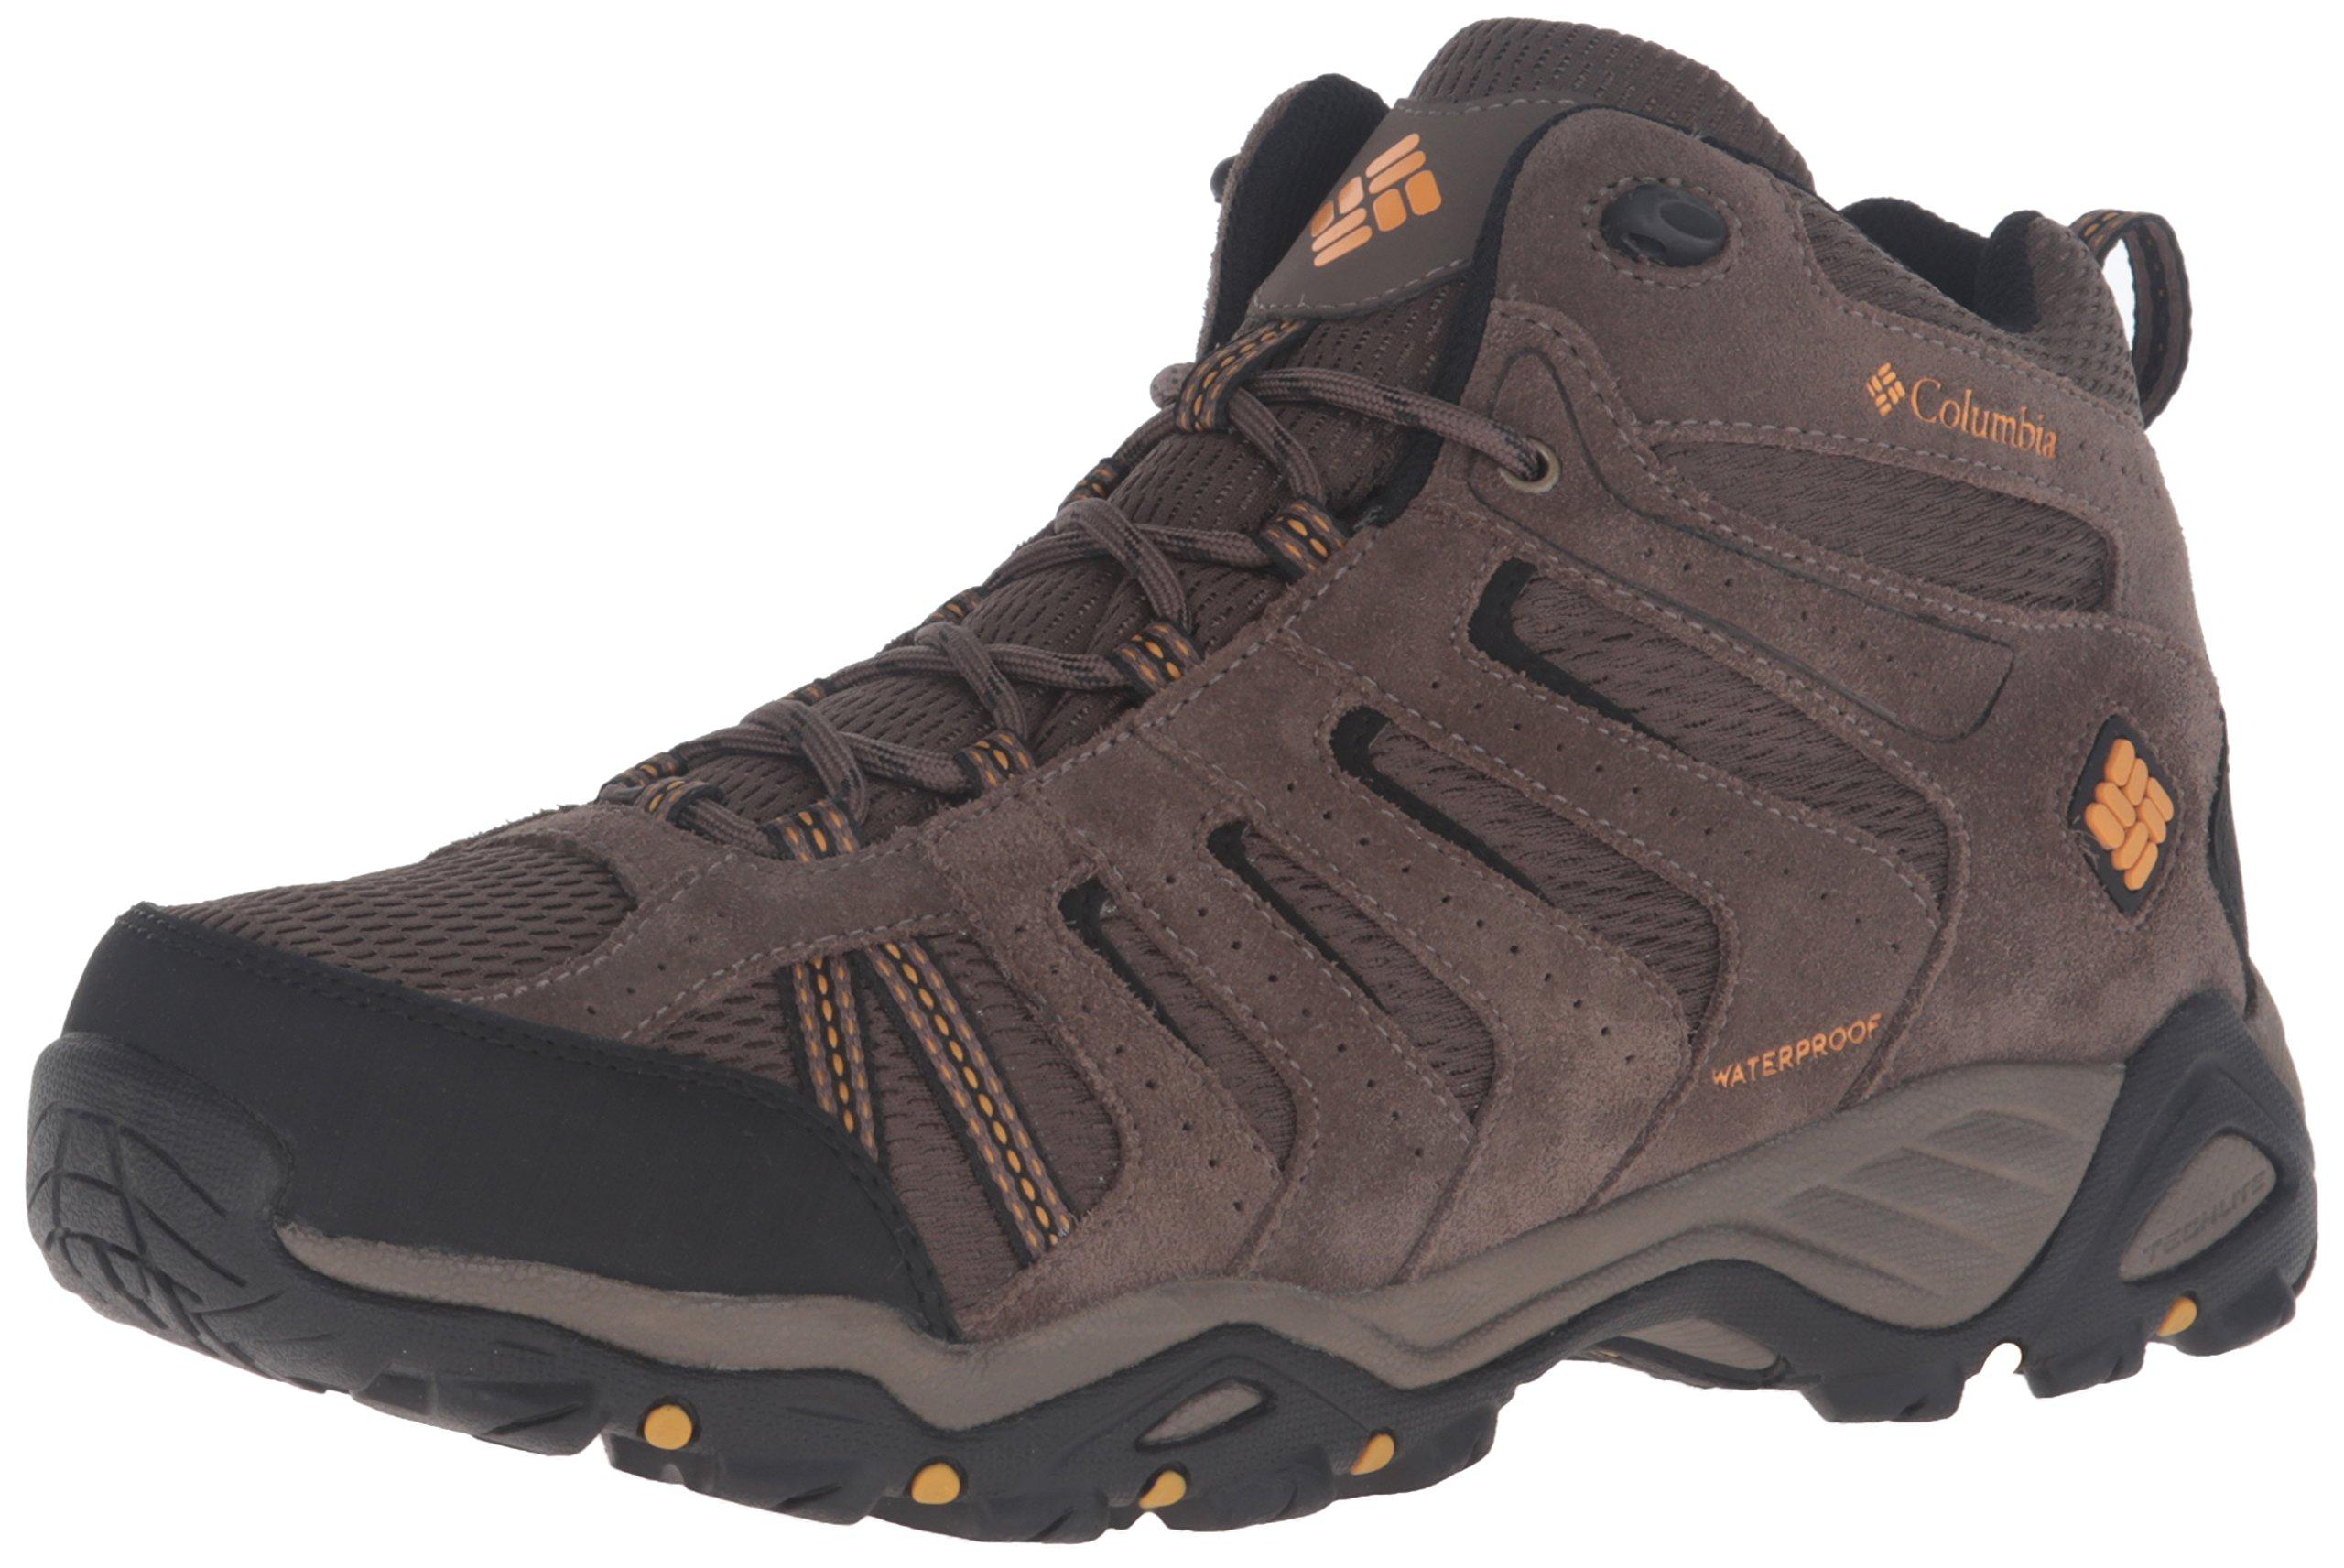 Columbia Men's North Plains Ii Waterproof Mid Hiking Boot, Mud, Squash, 10.5 D US